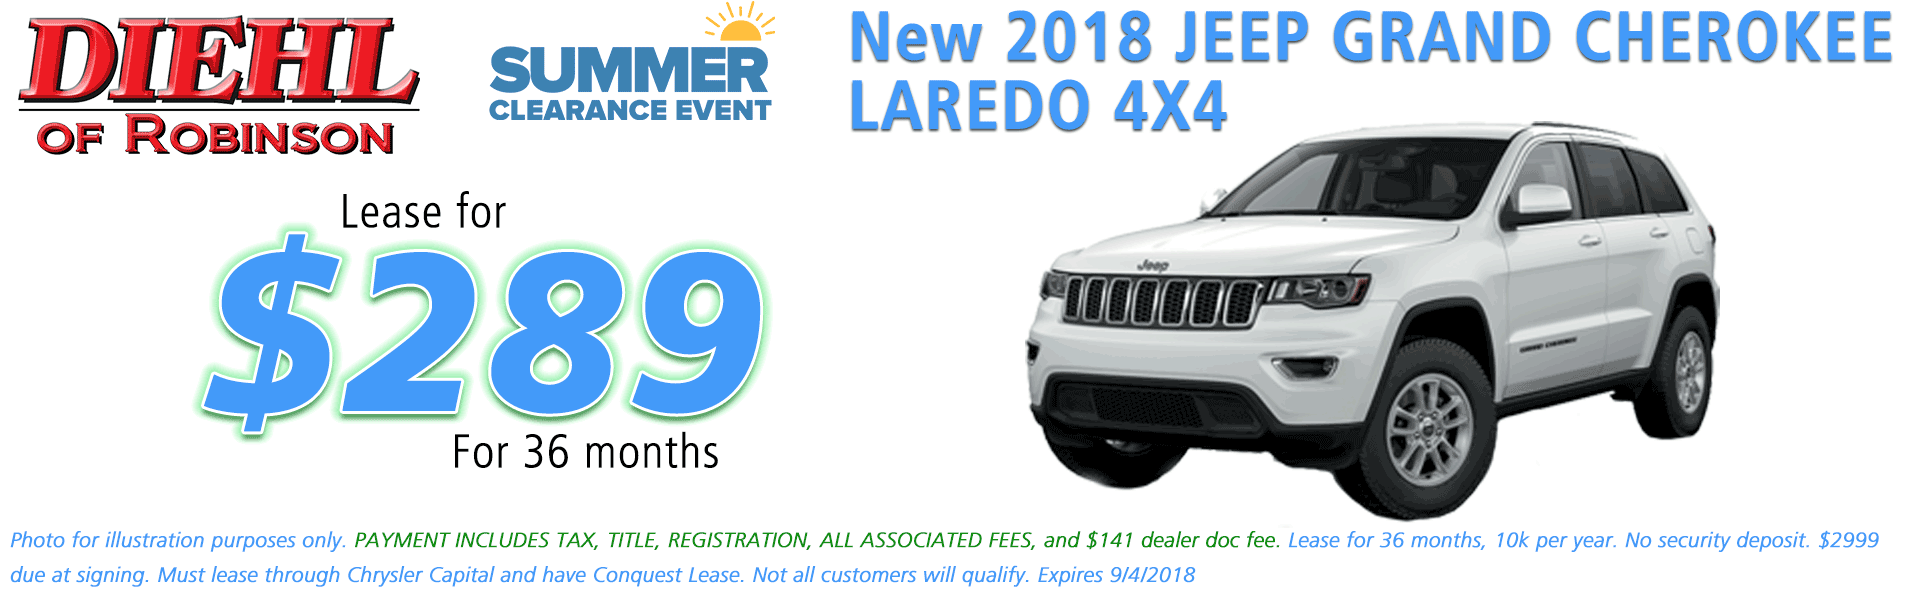 Diehl of Robinson Chrysler Dodge Jeep Ram Robinson Township PA 15136 NEW 2018 JEEP GRAND CHEROKEE LAREDO E 4X4